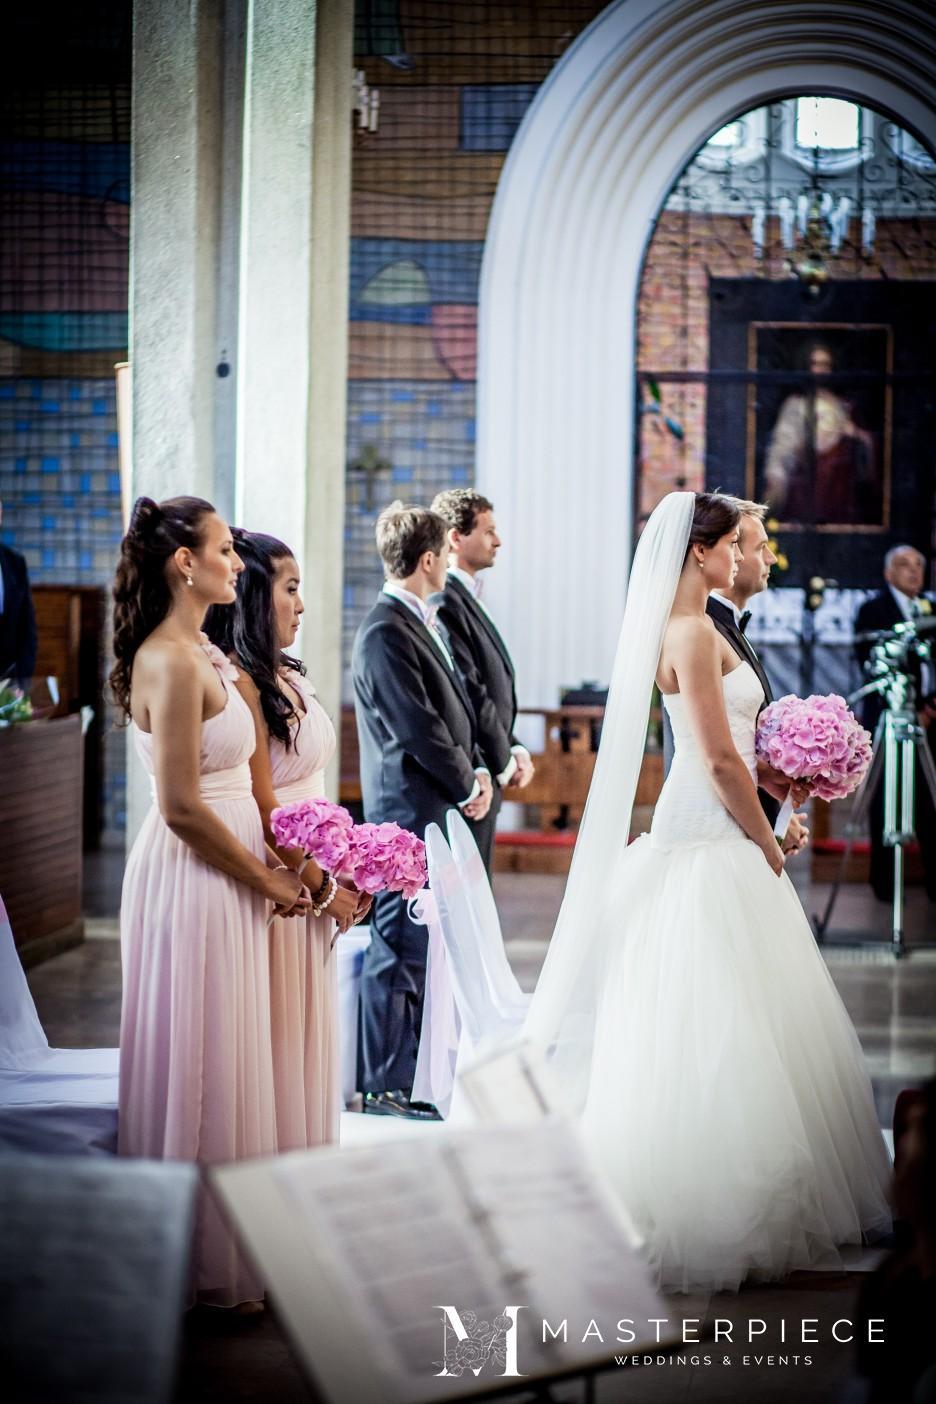 Masterpiece_Weddings_sluby_004